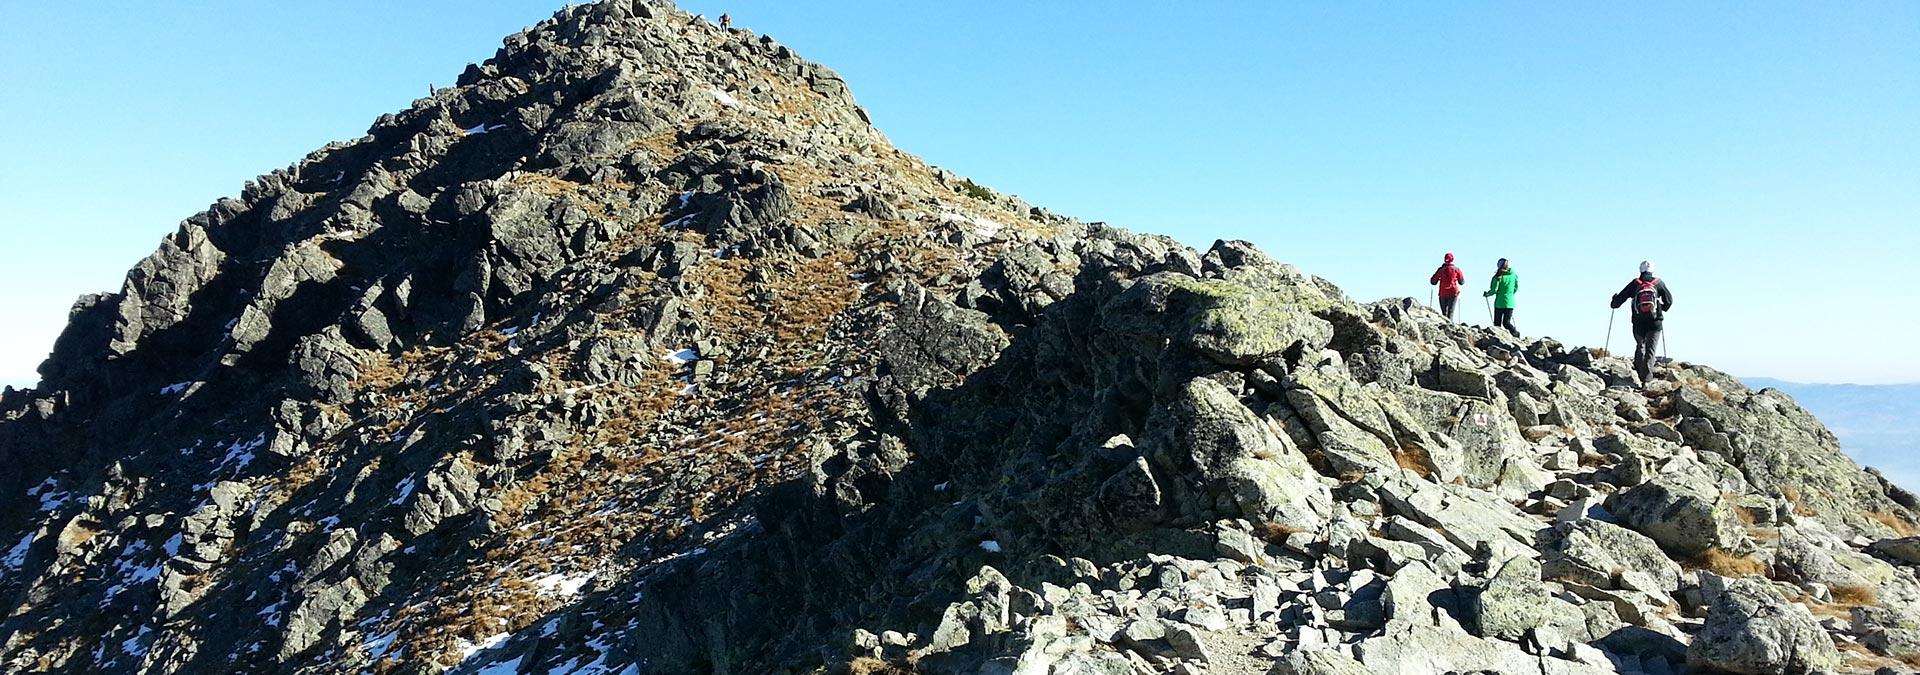 The Trek Hut to Hut Tour across Slovak Largest Mountain Range, the High Tatras, Slovakia Travel, Location